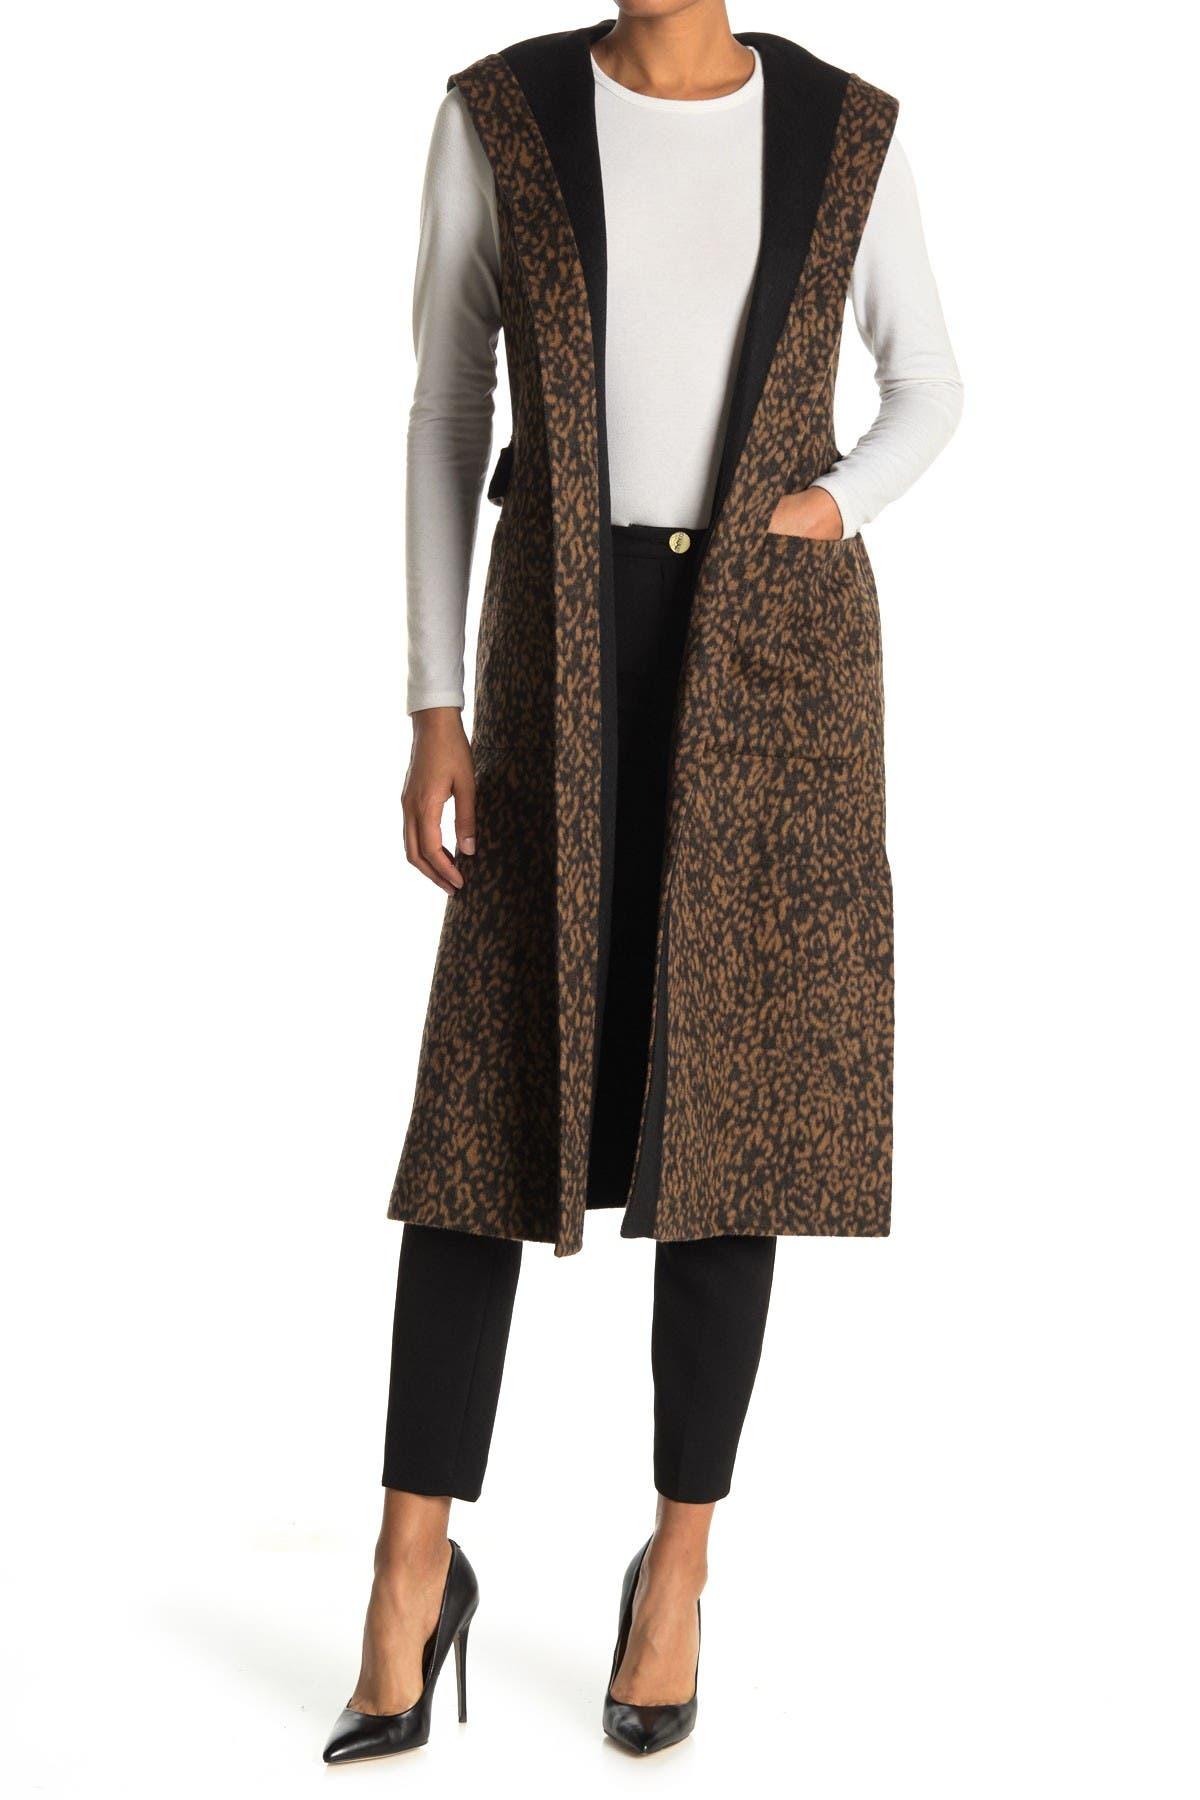 Image of BCBGMAXAZRIA Wool Blend Reversible Hooded Vest